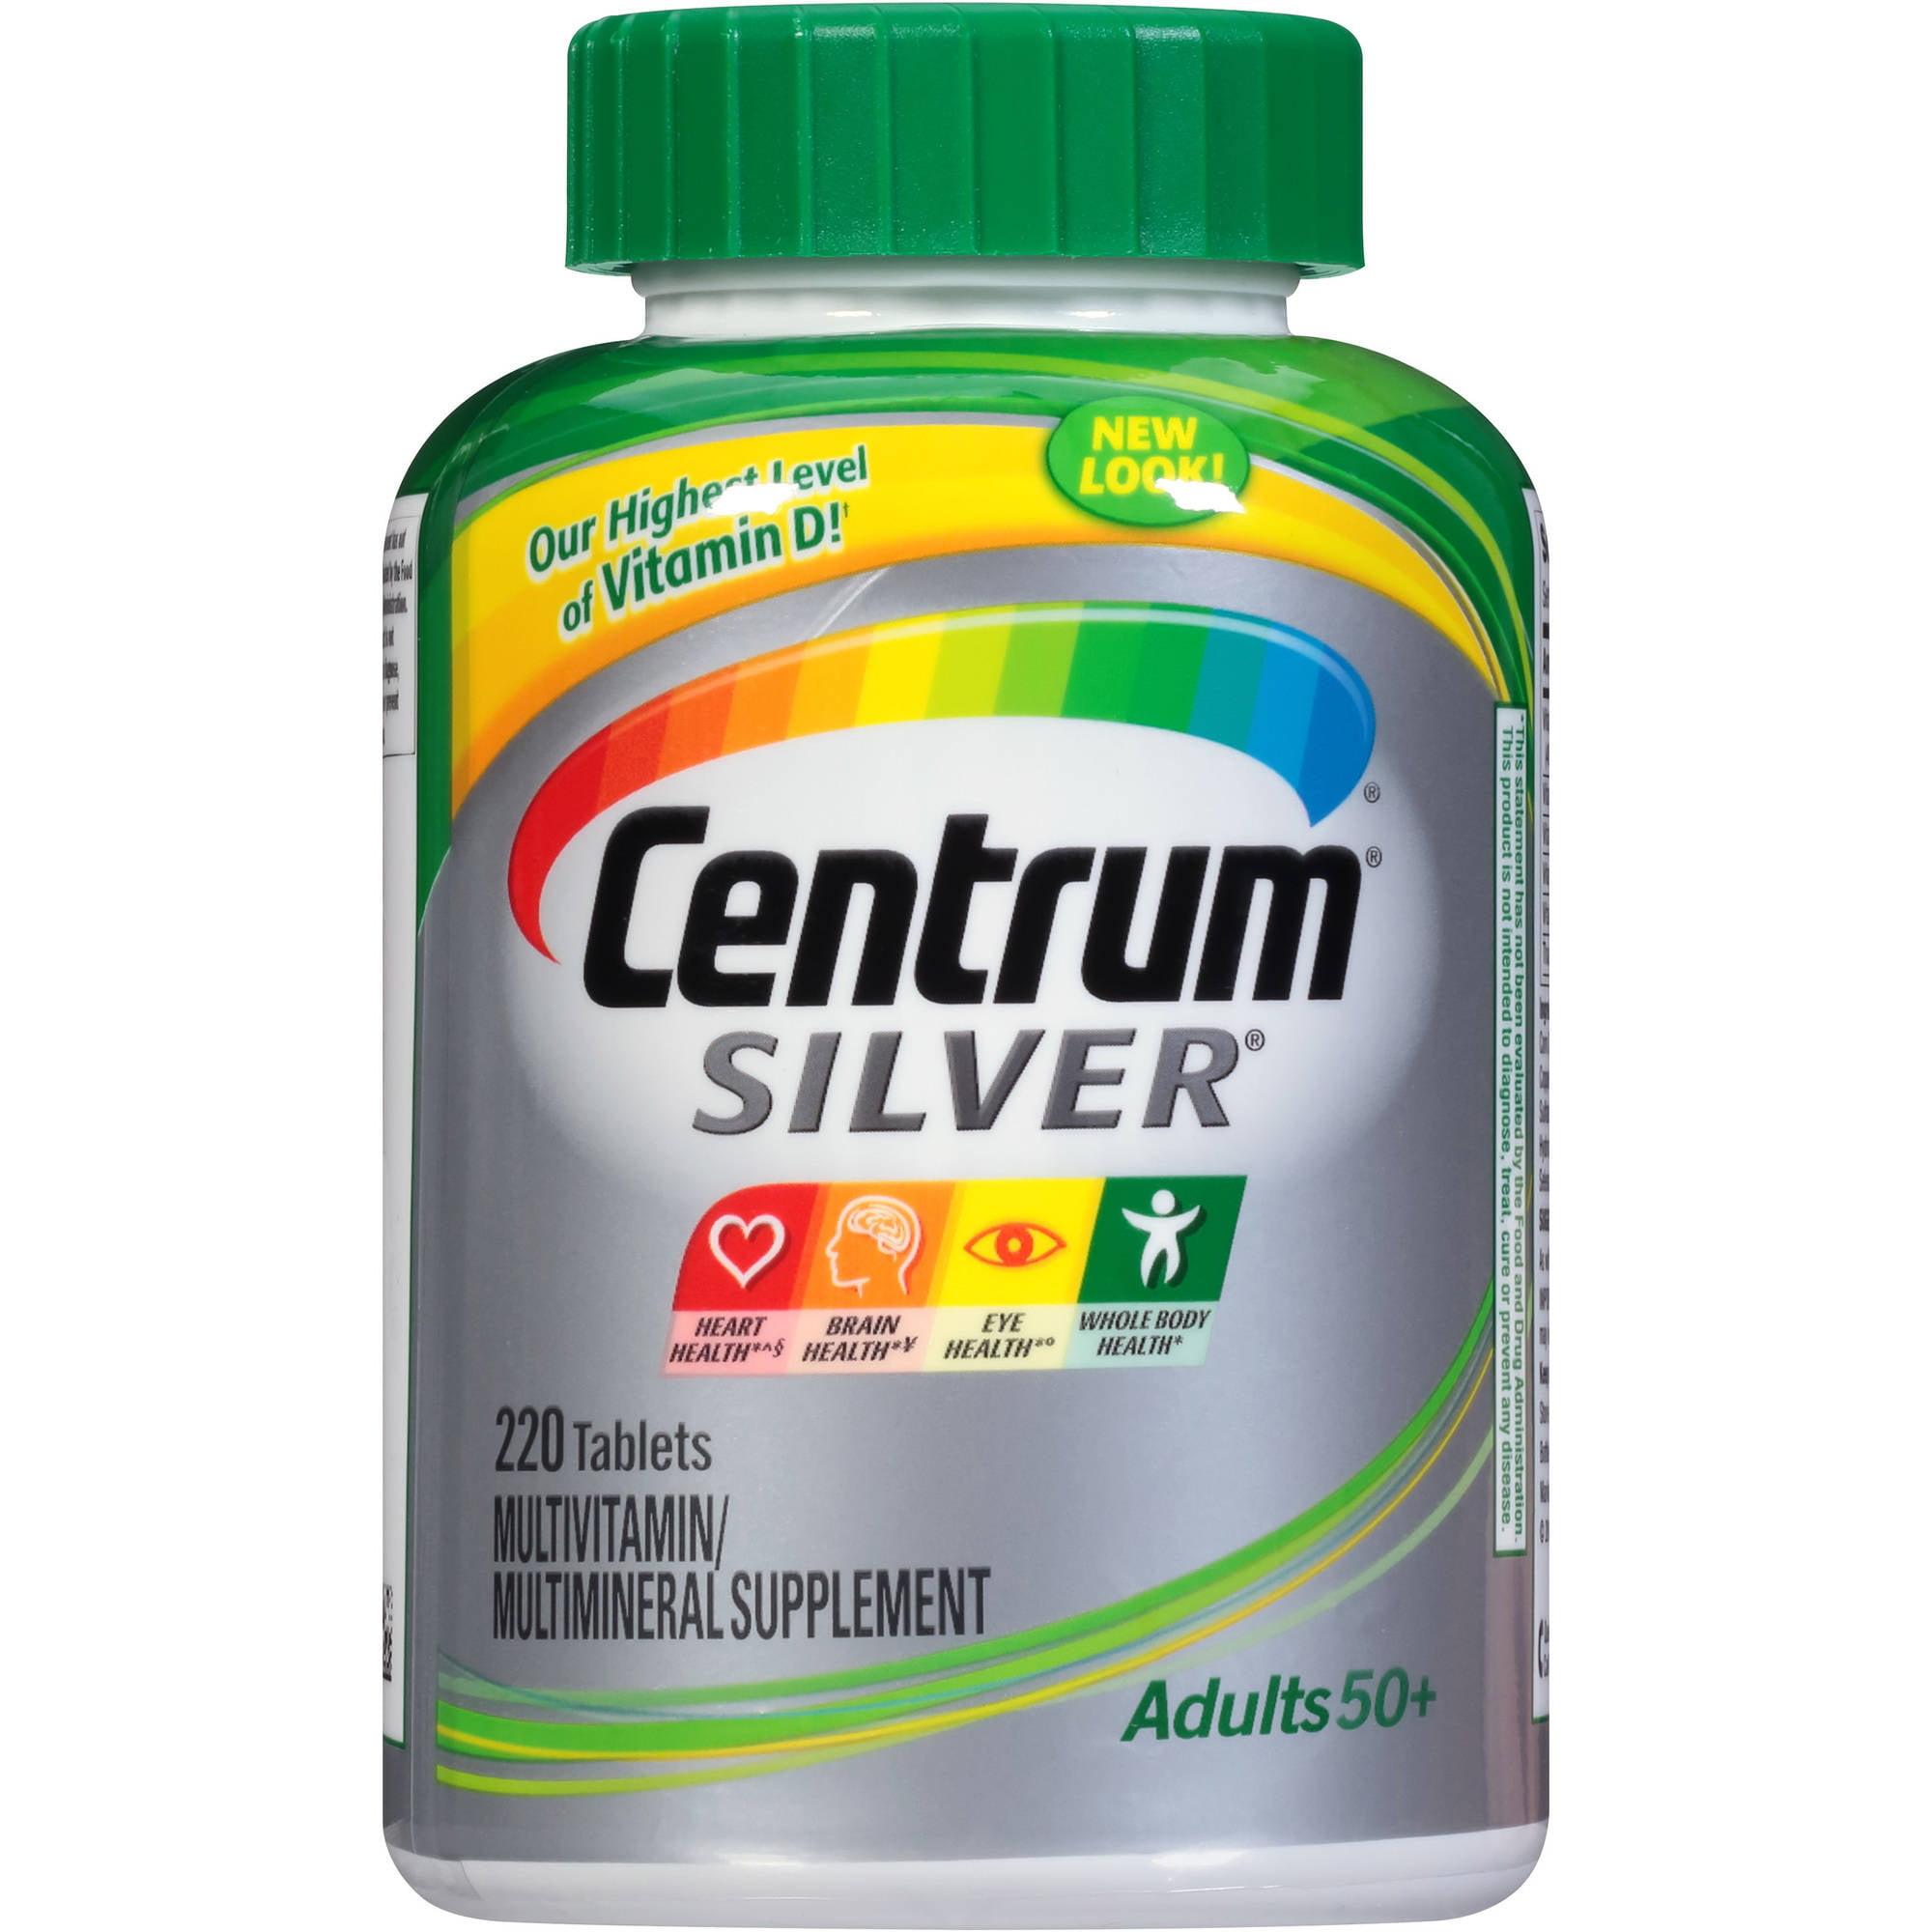 Centrum Silver Adult Multivitamin/Multimineral Supplement 220 Count